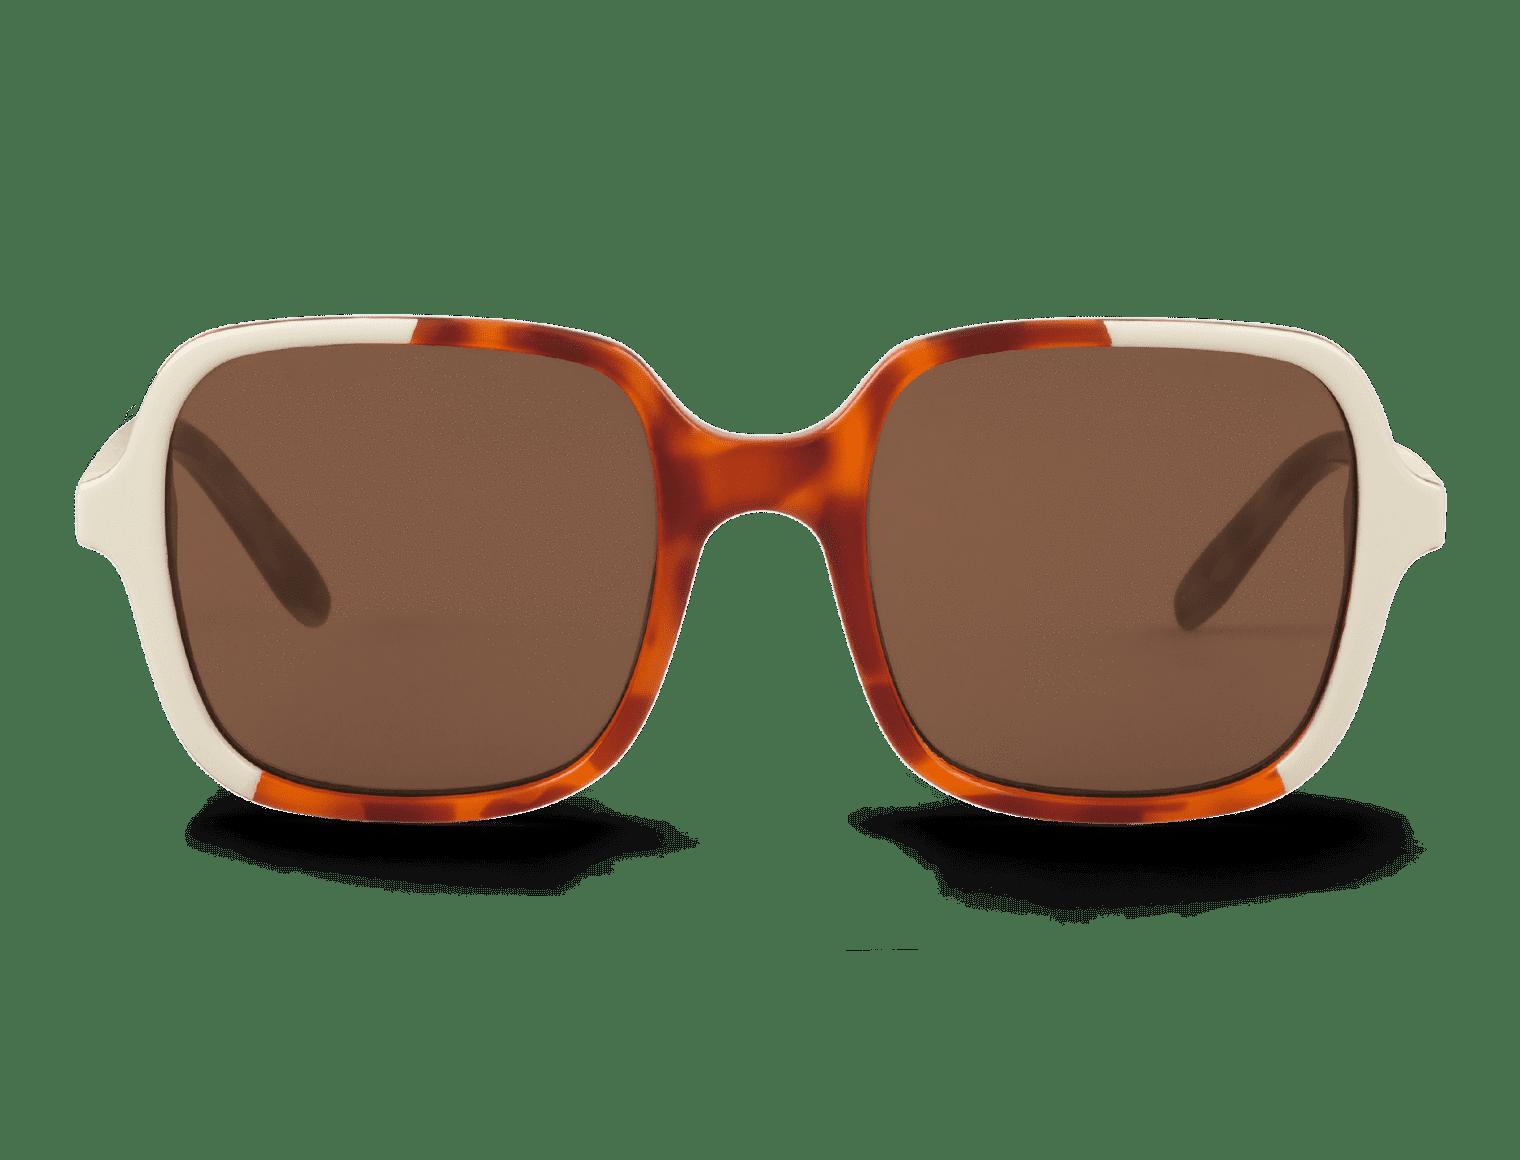 BELLEVILLE | CREAM/LEO TORTOISE with classical lenses